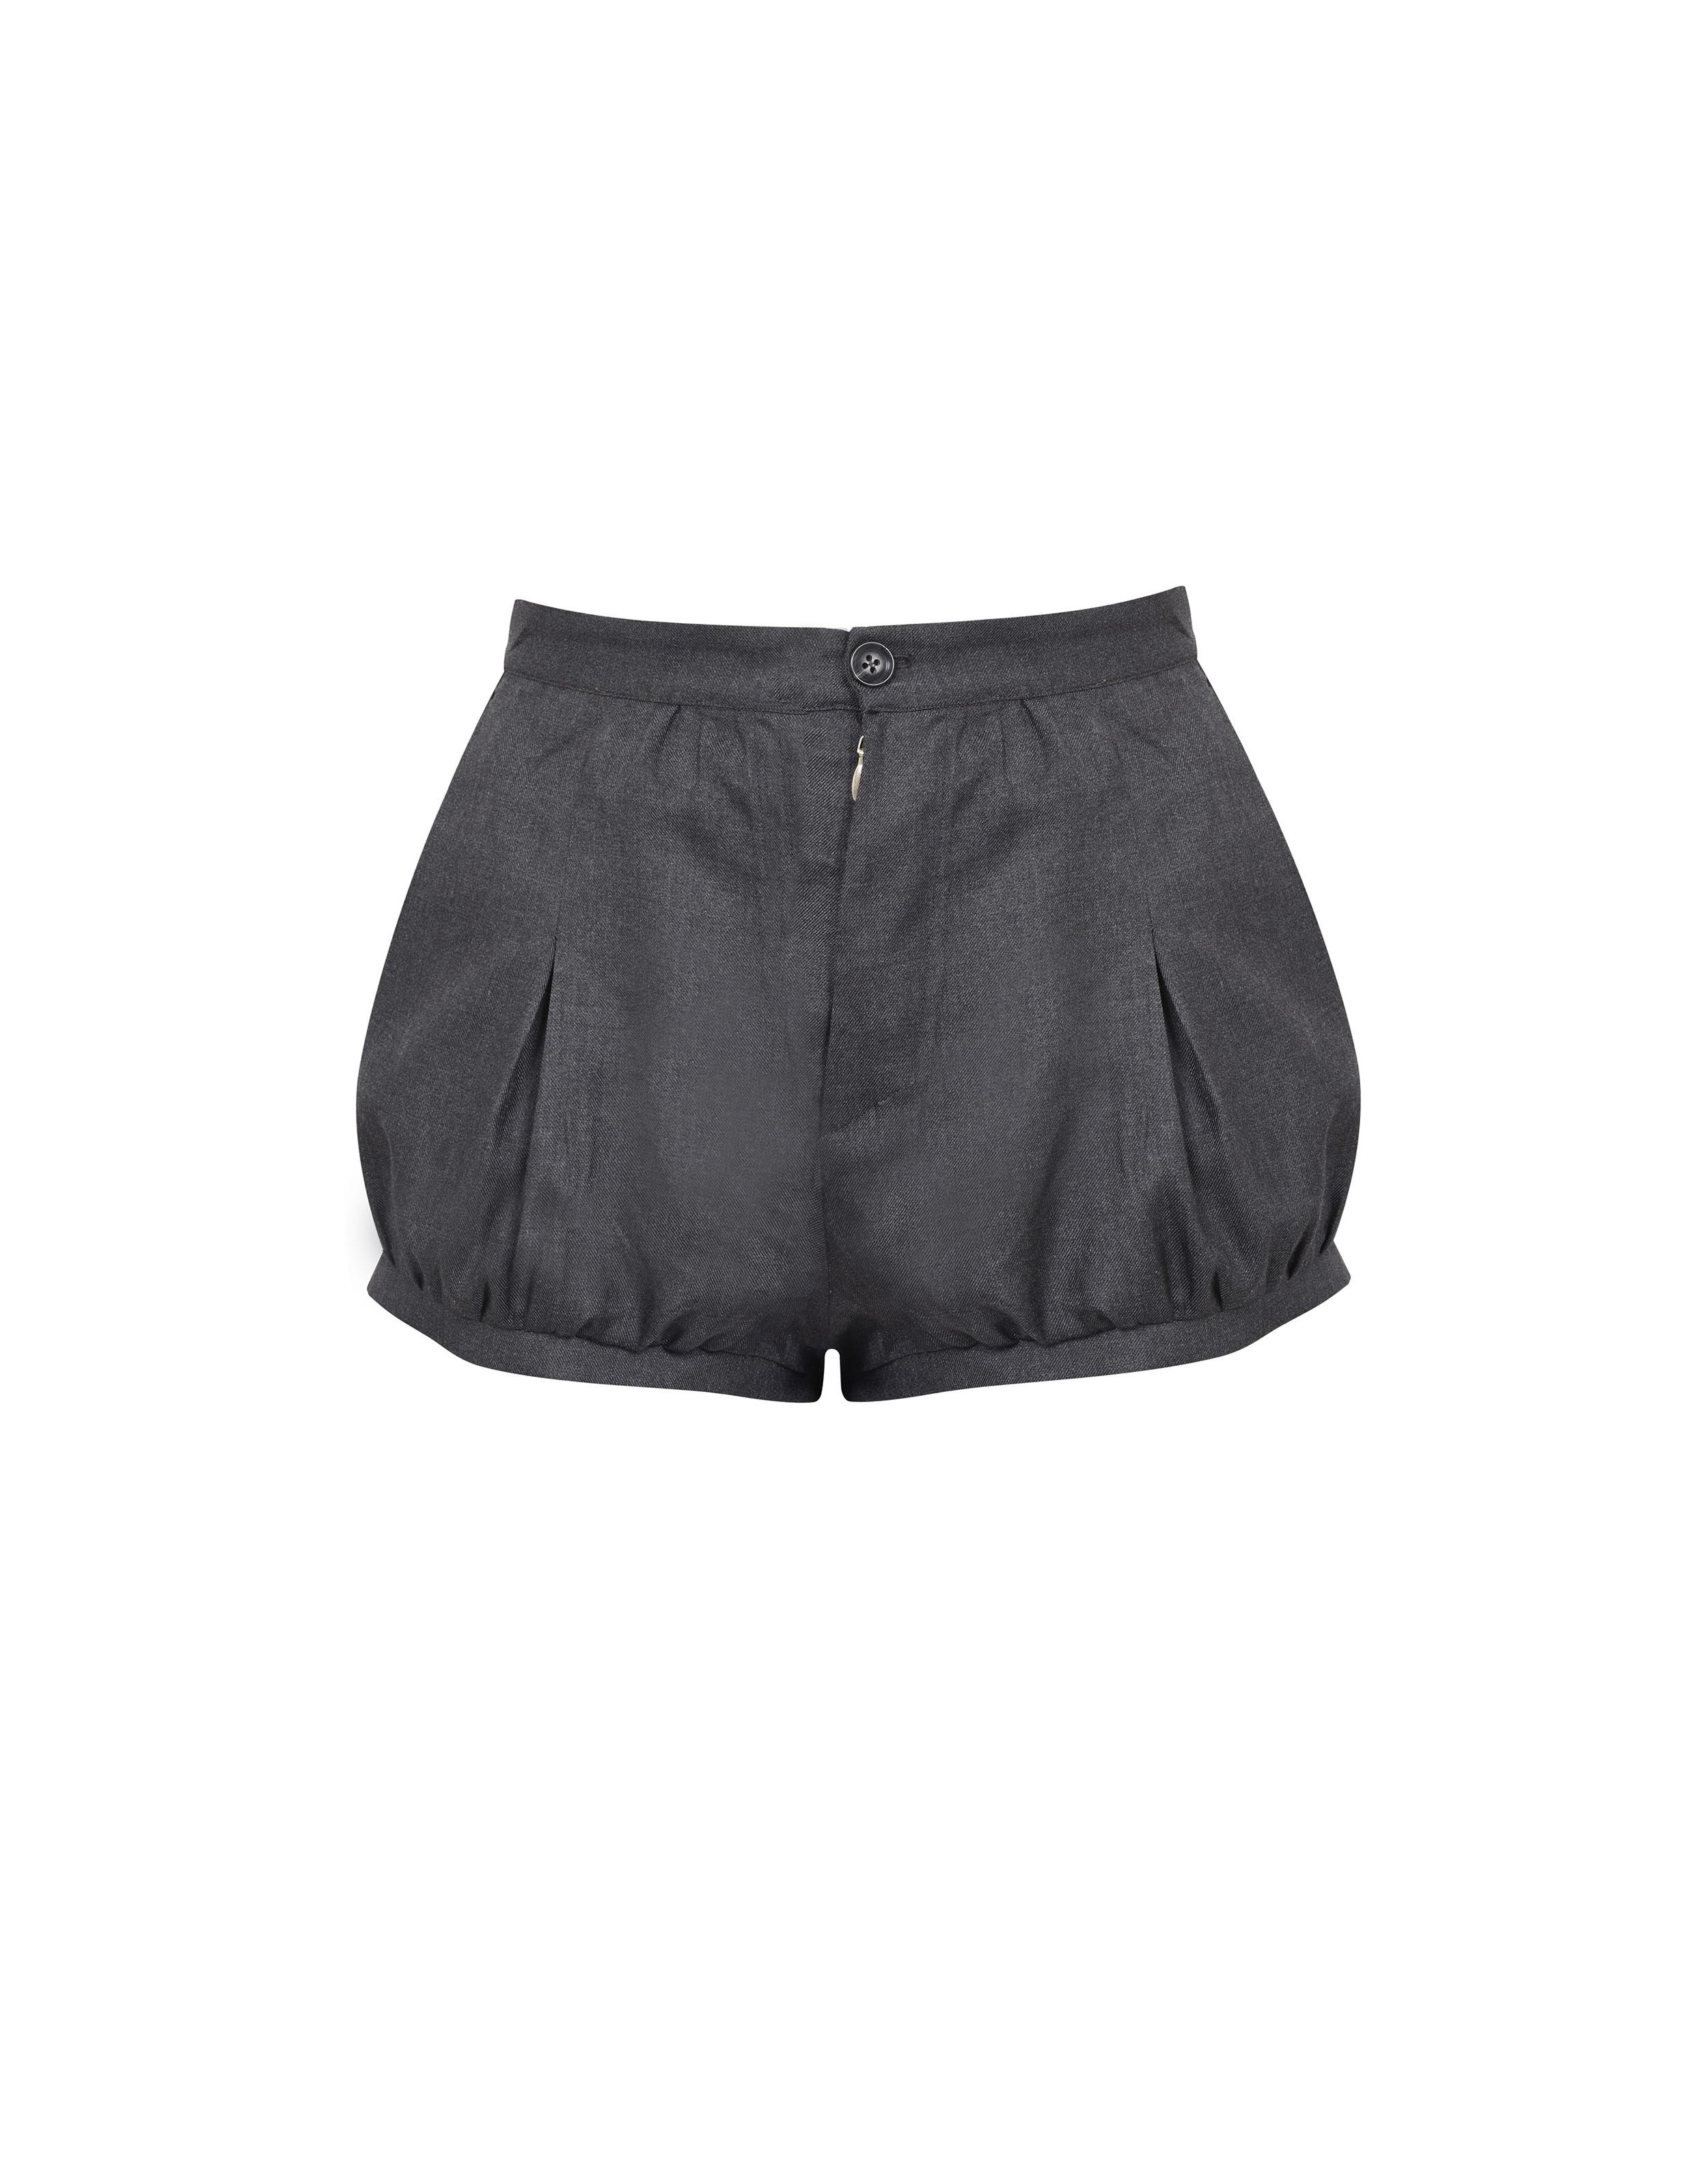 Agent Provocateur Deb Shorts Grey